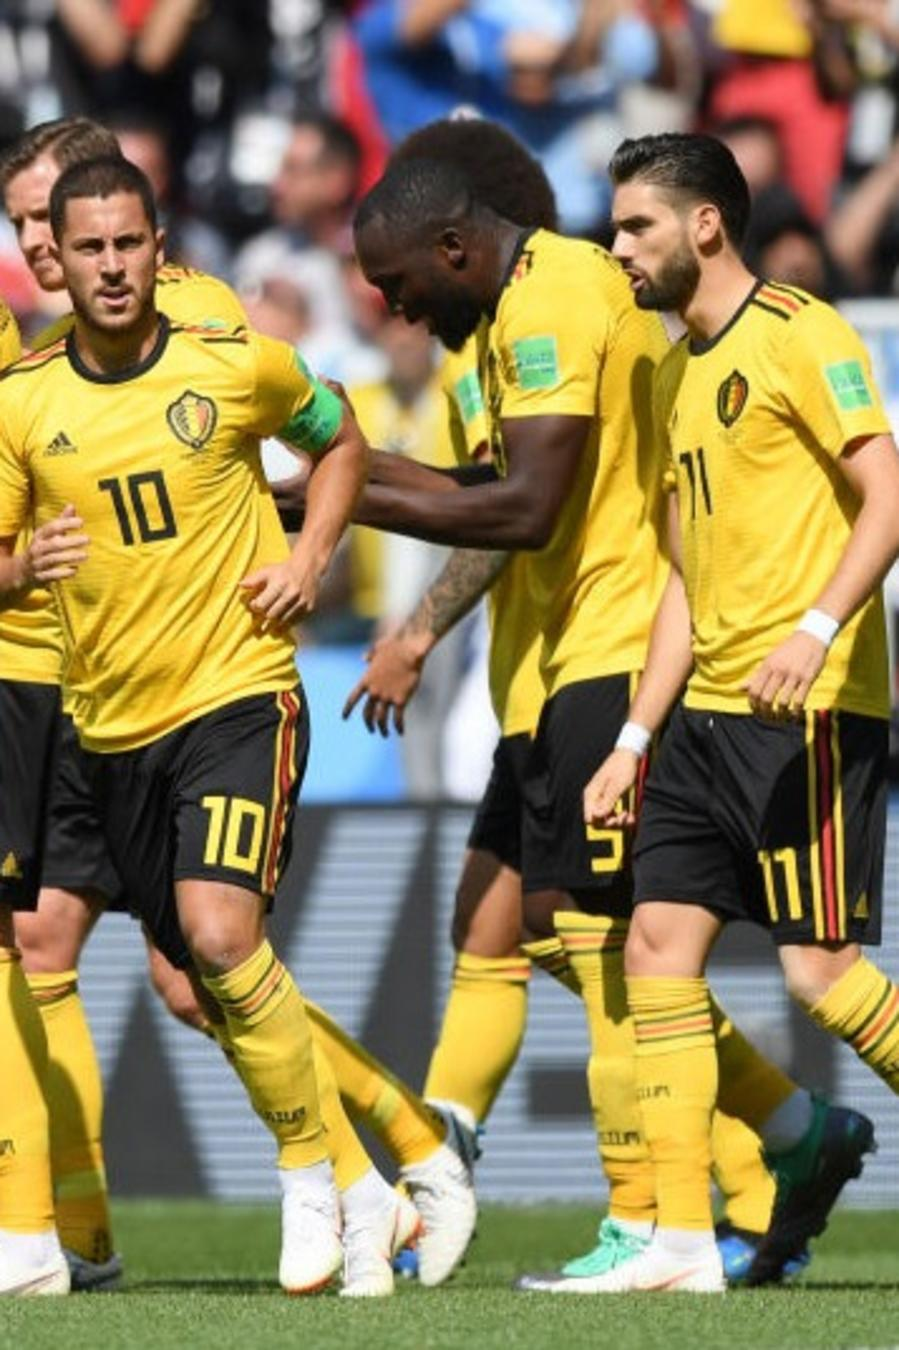 Bélgica vs. Túnez HL